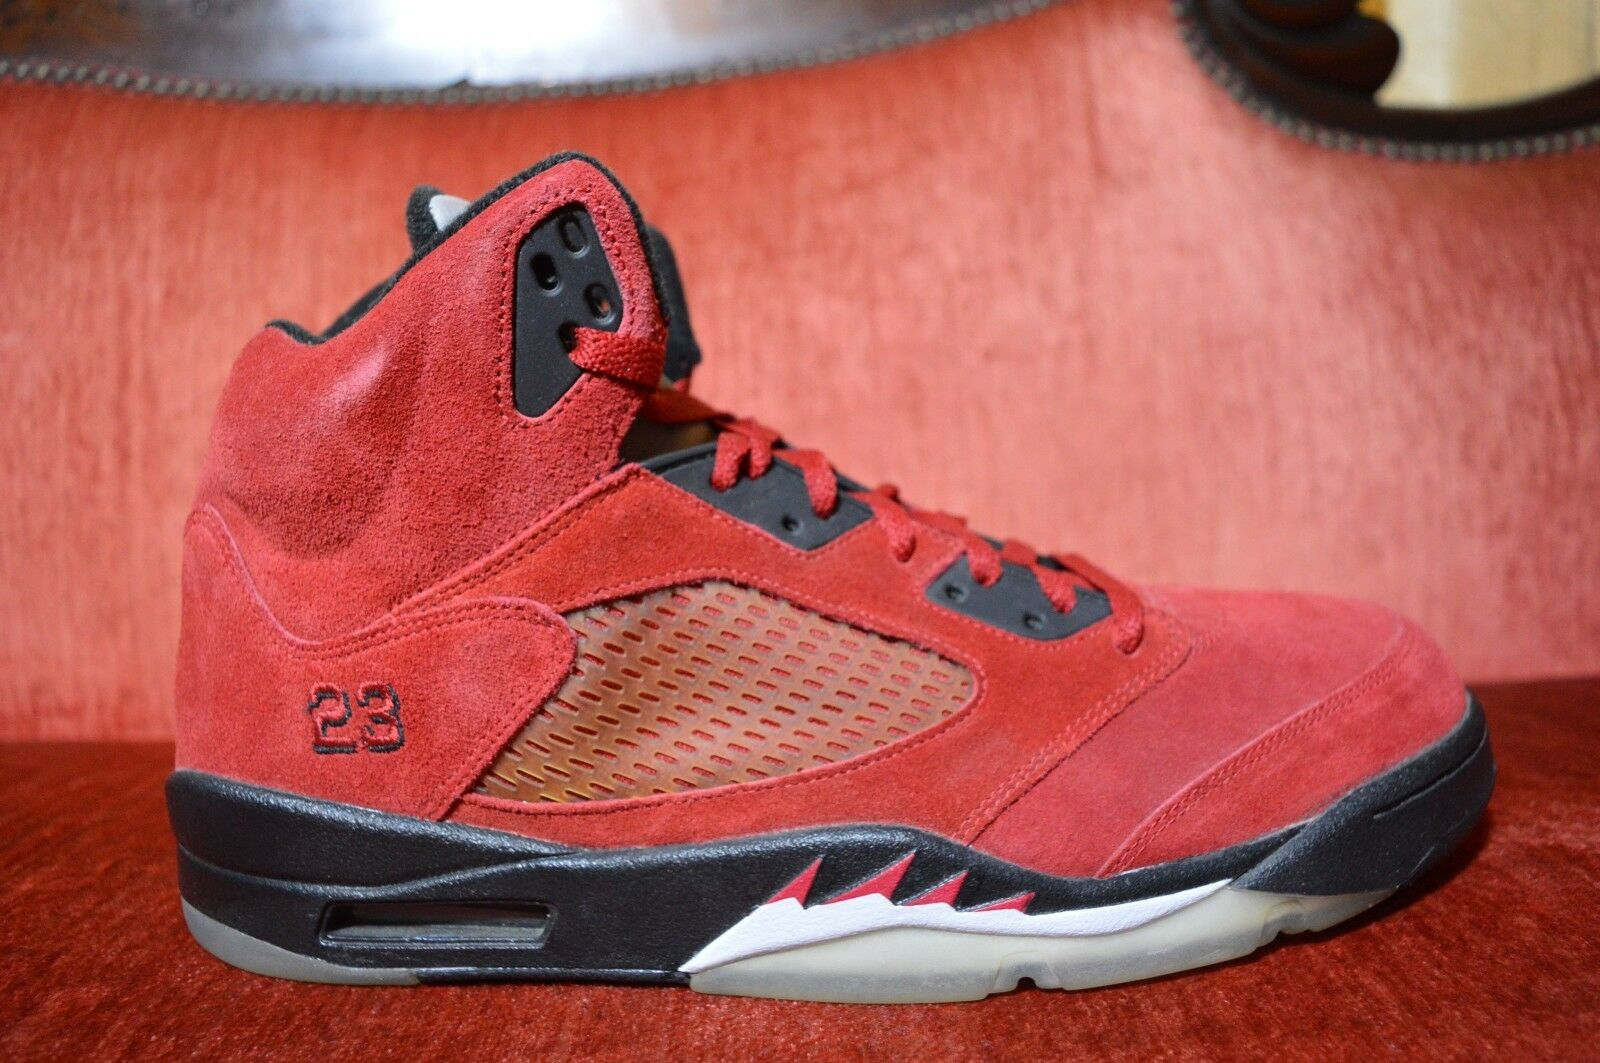 Nike Air Jordan 5 Red V Retro